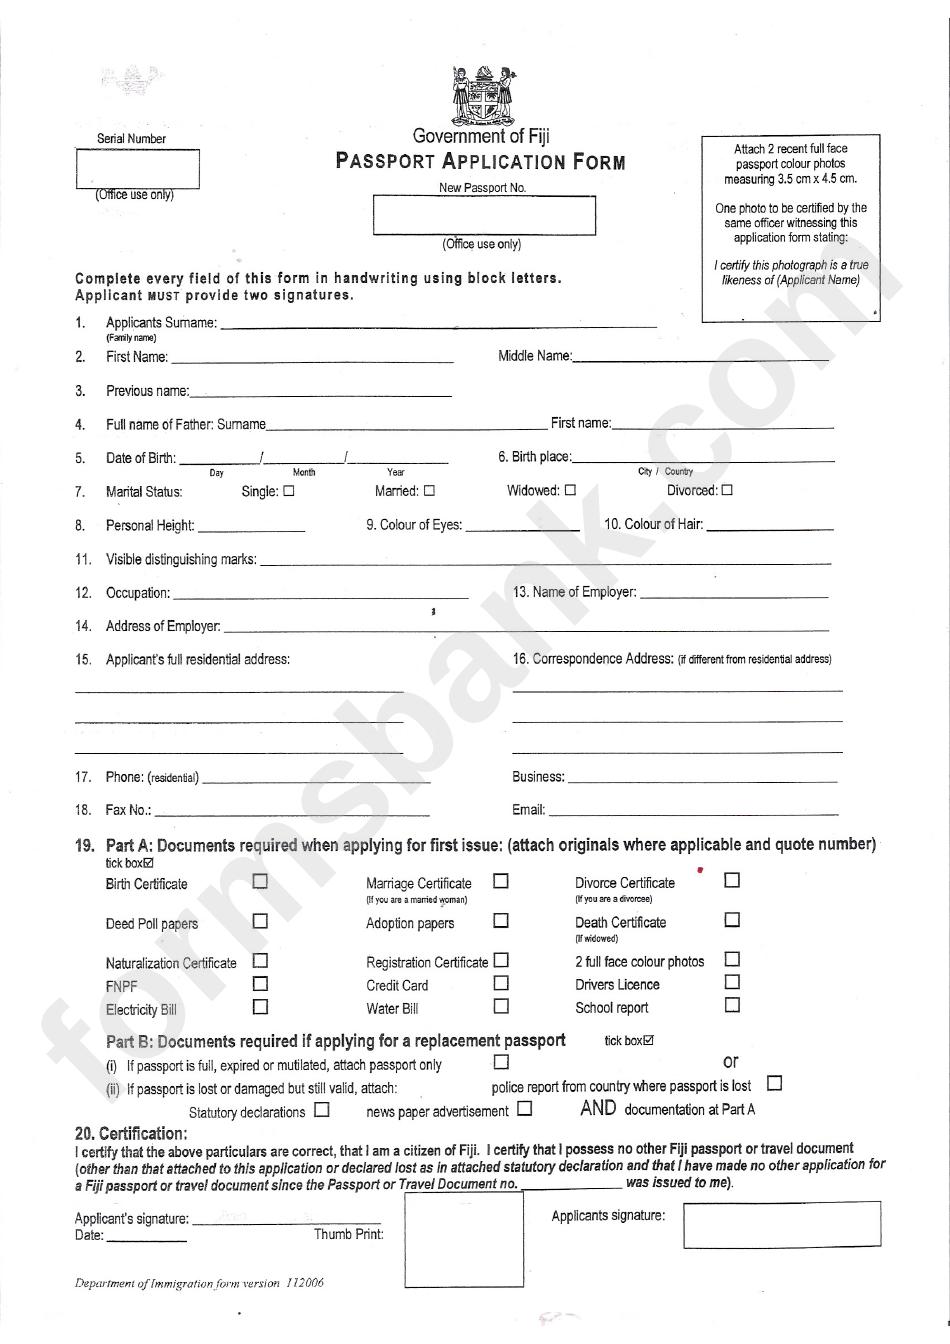 Passport Application Form Printable Pdf Download